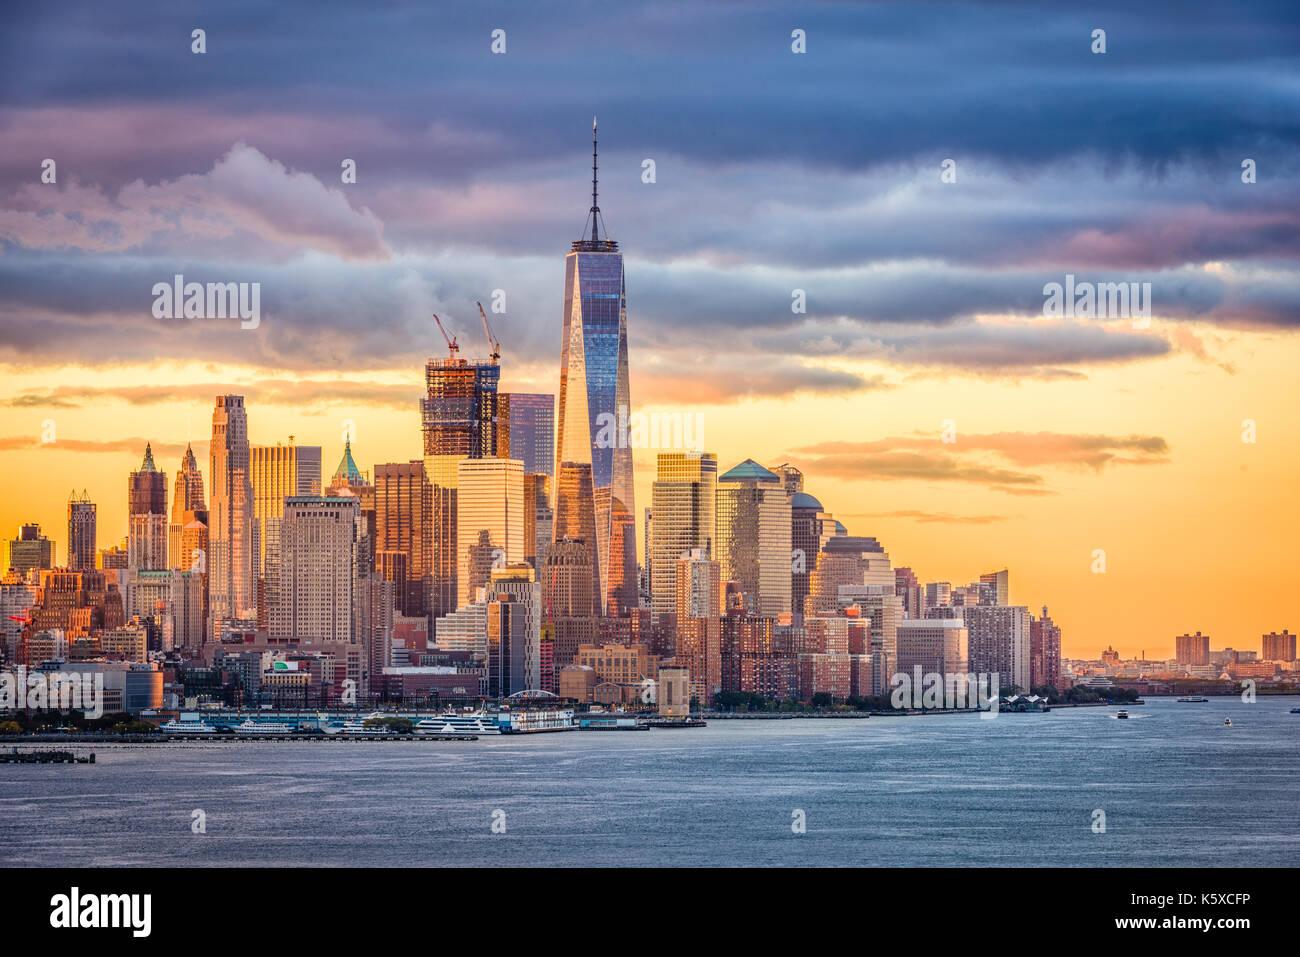 New York City Financial District auf dem Hudson River in der Morgendämmerung. Stockbild